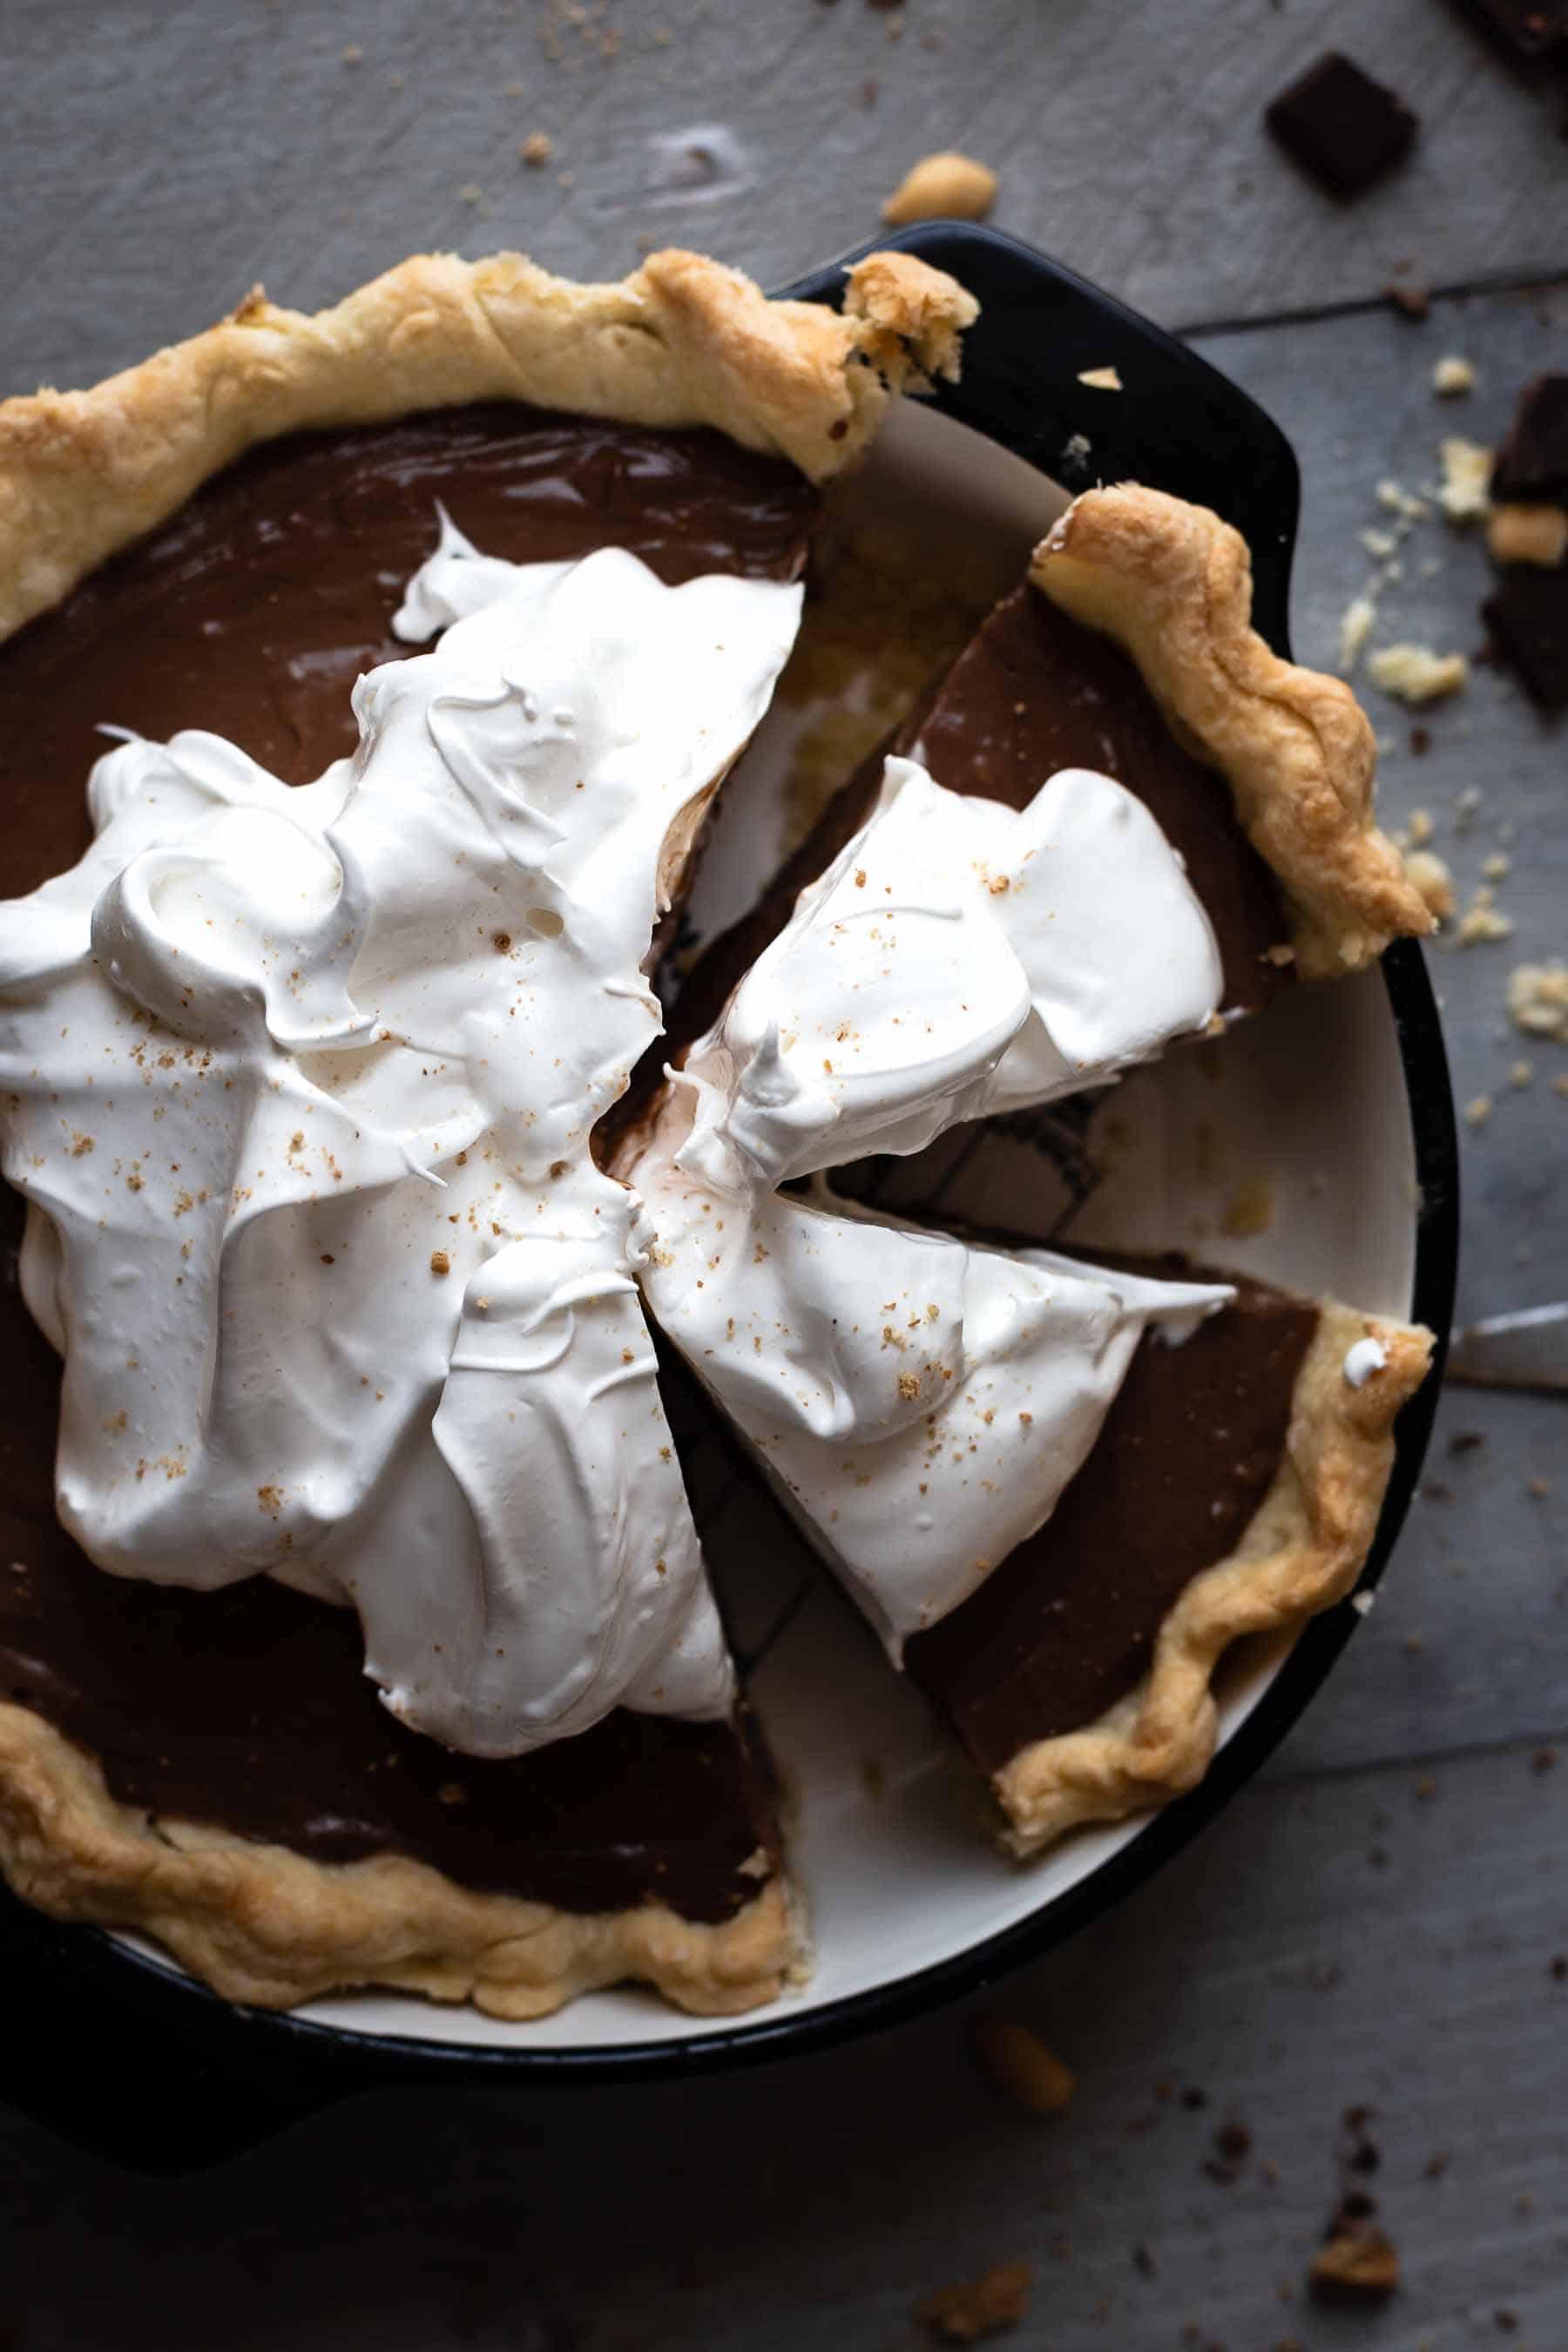 slices of chocolate cream pie